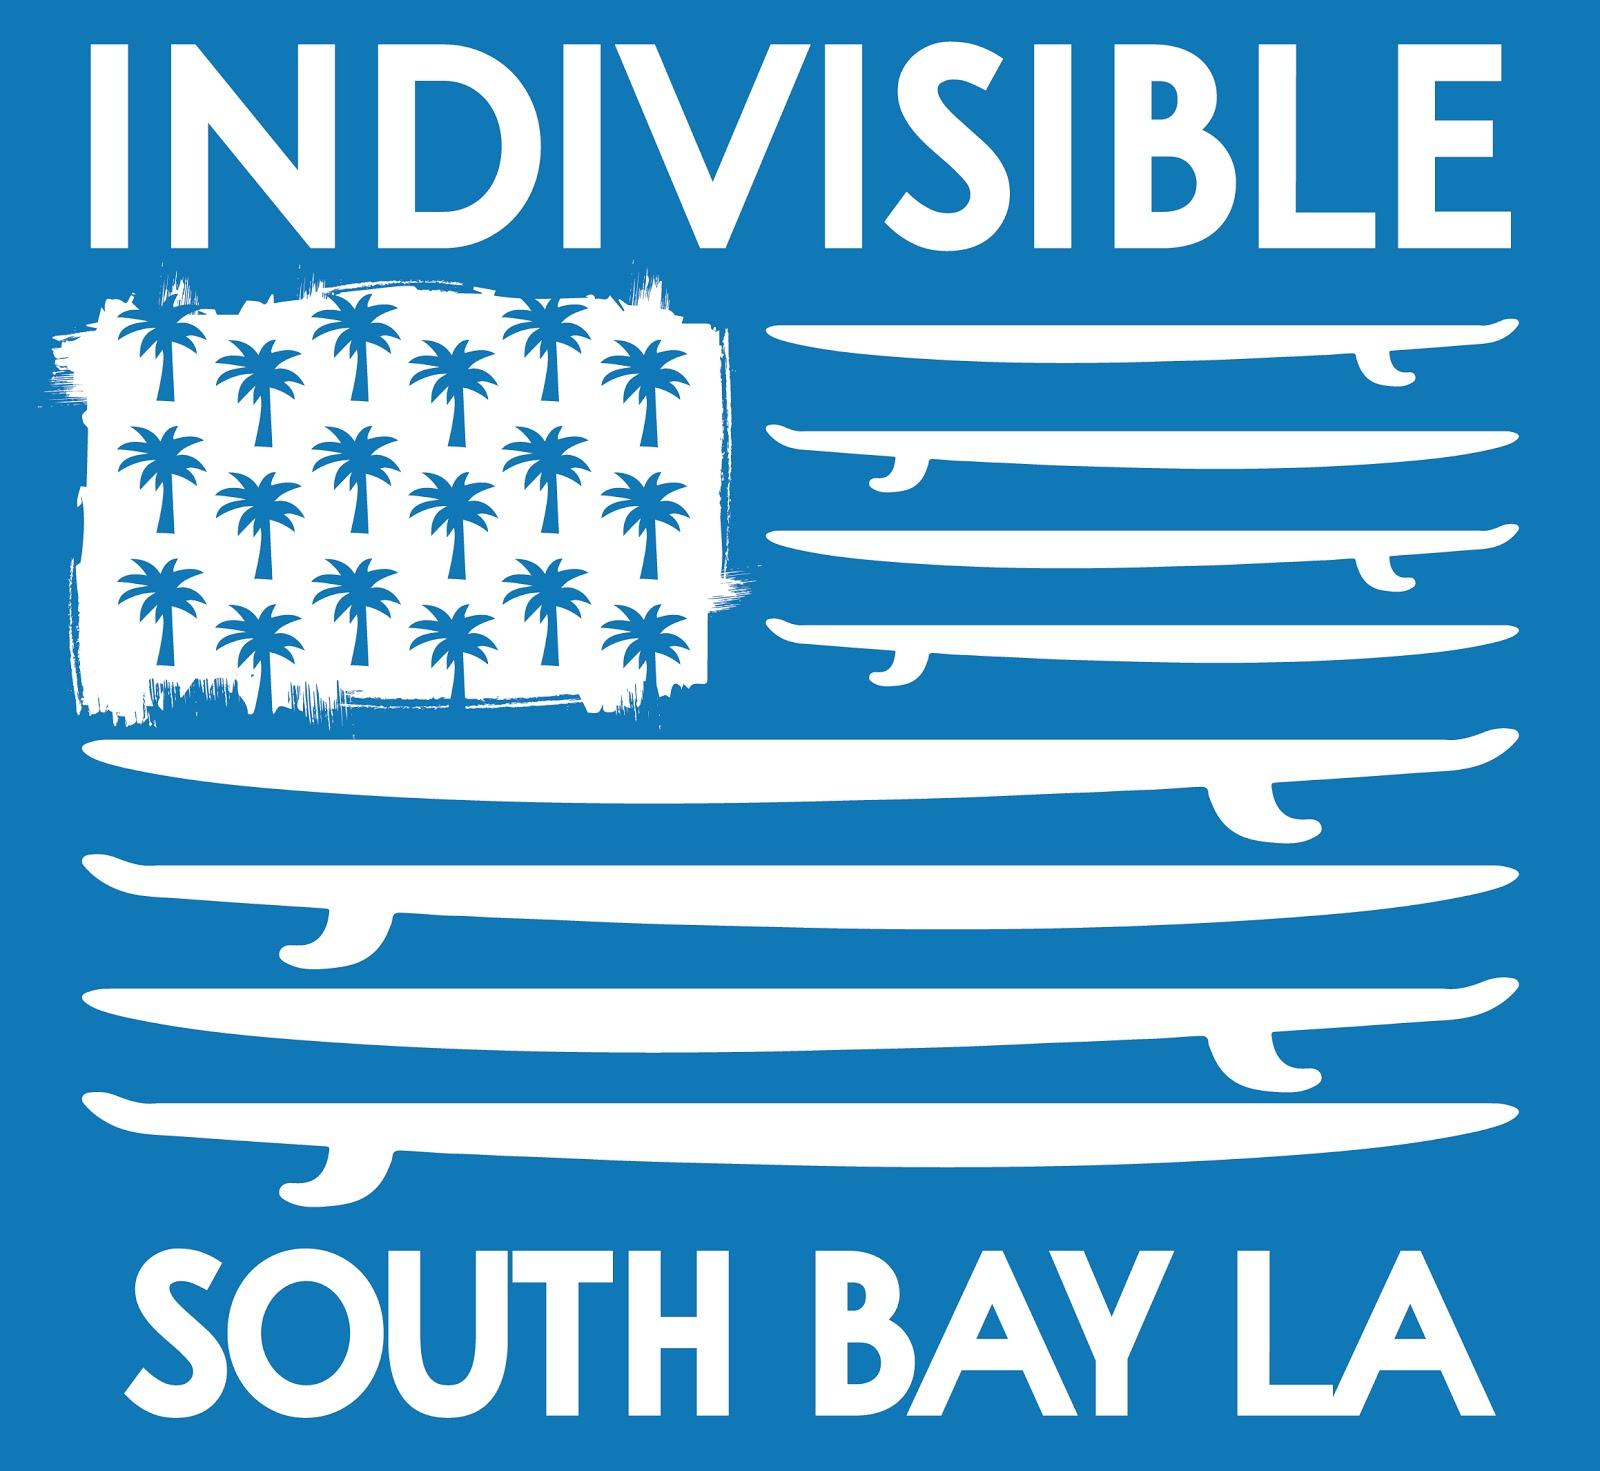 Indivisible South Bay Los Angeles